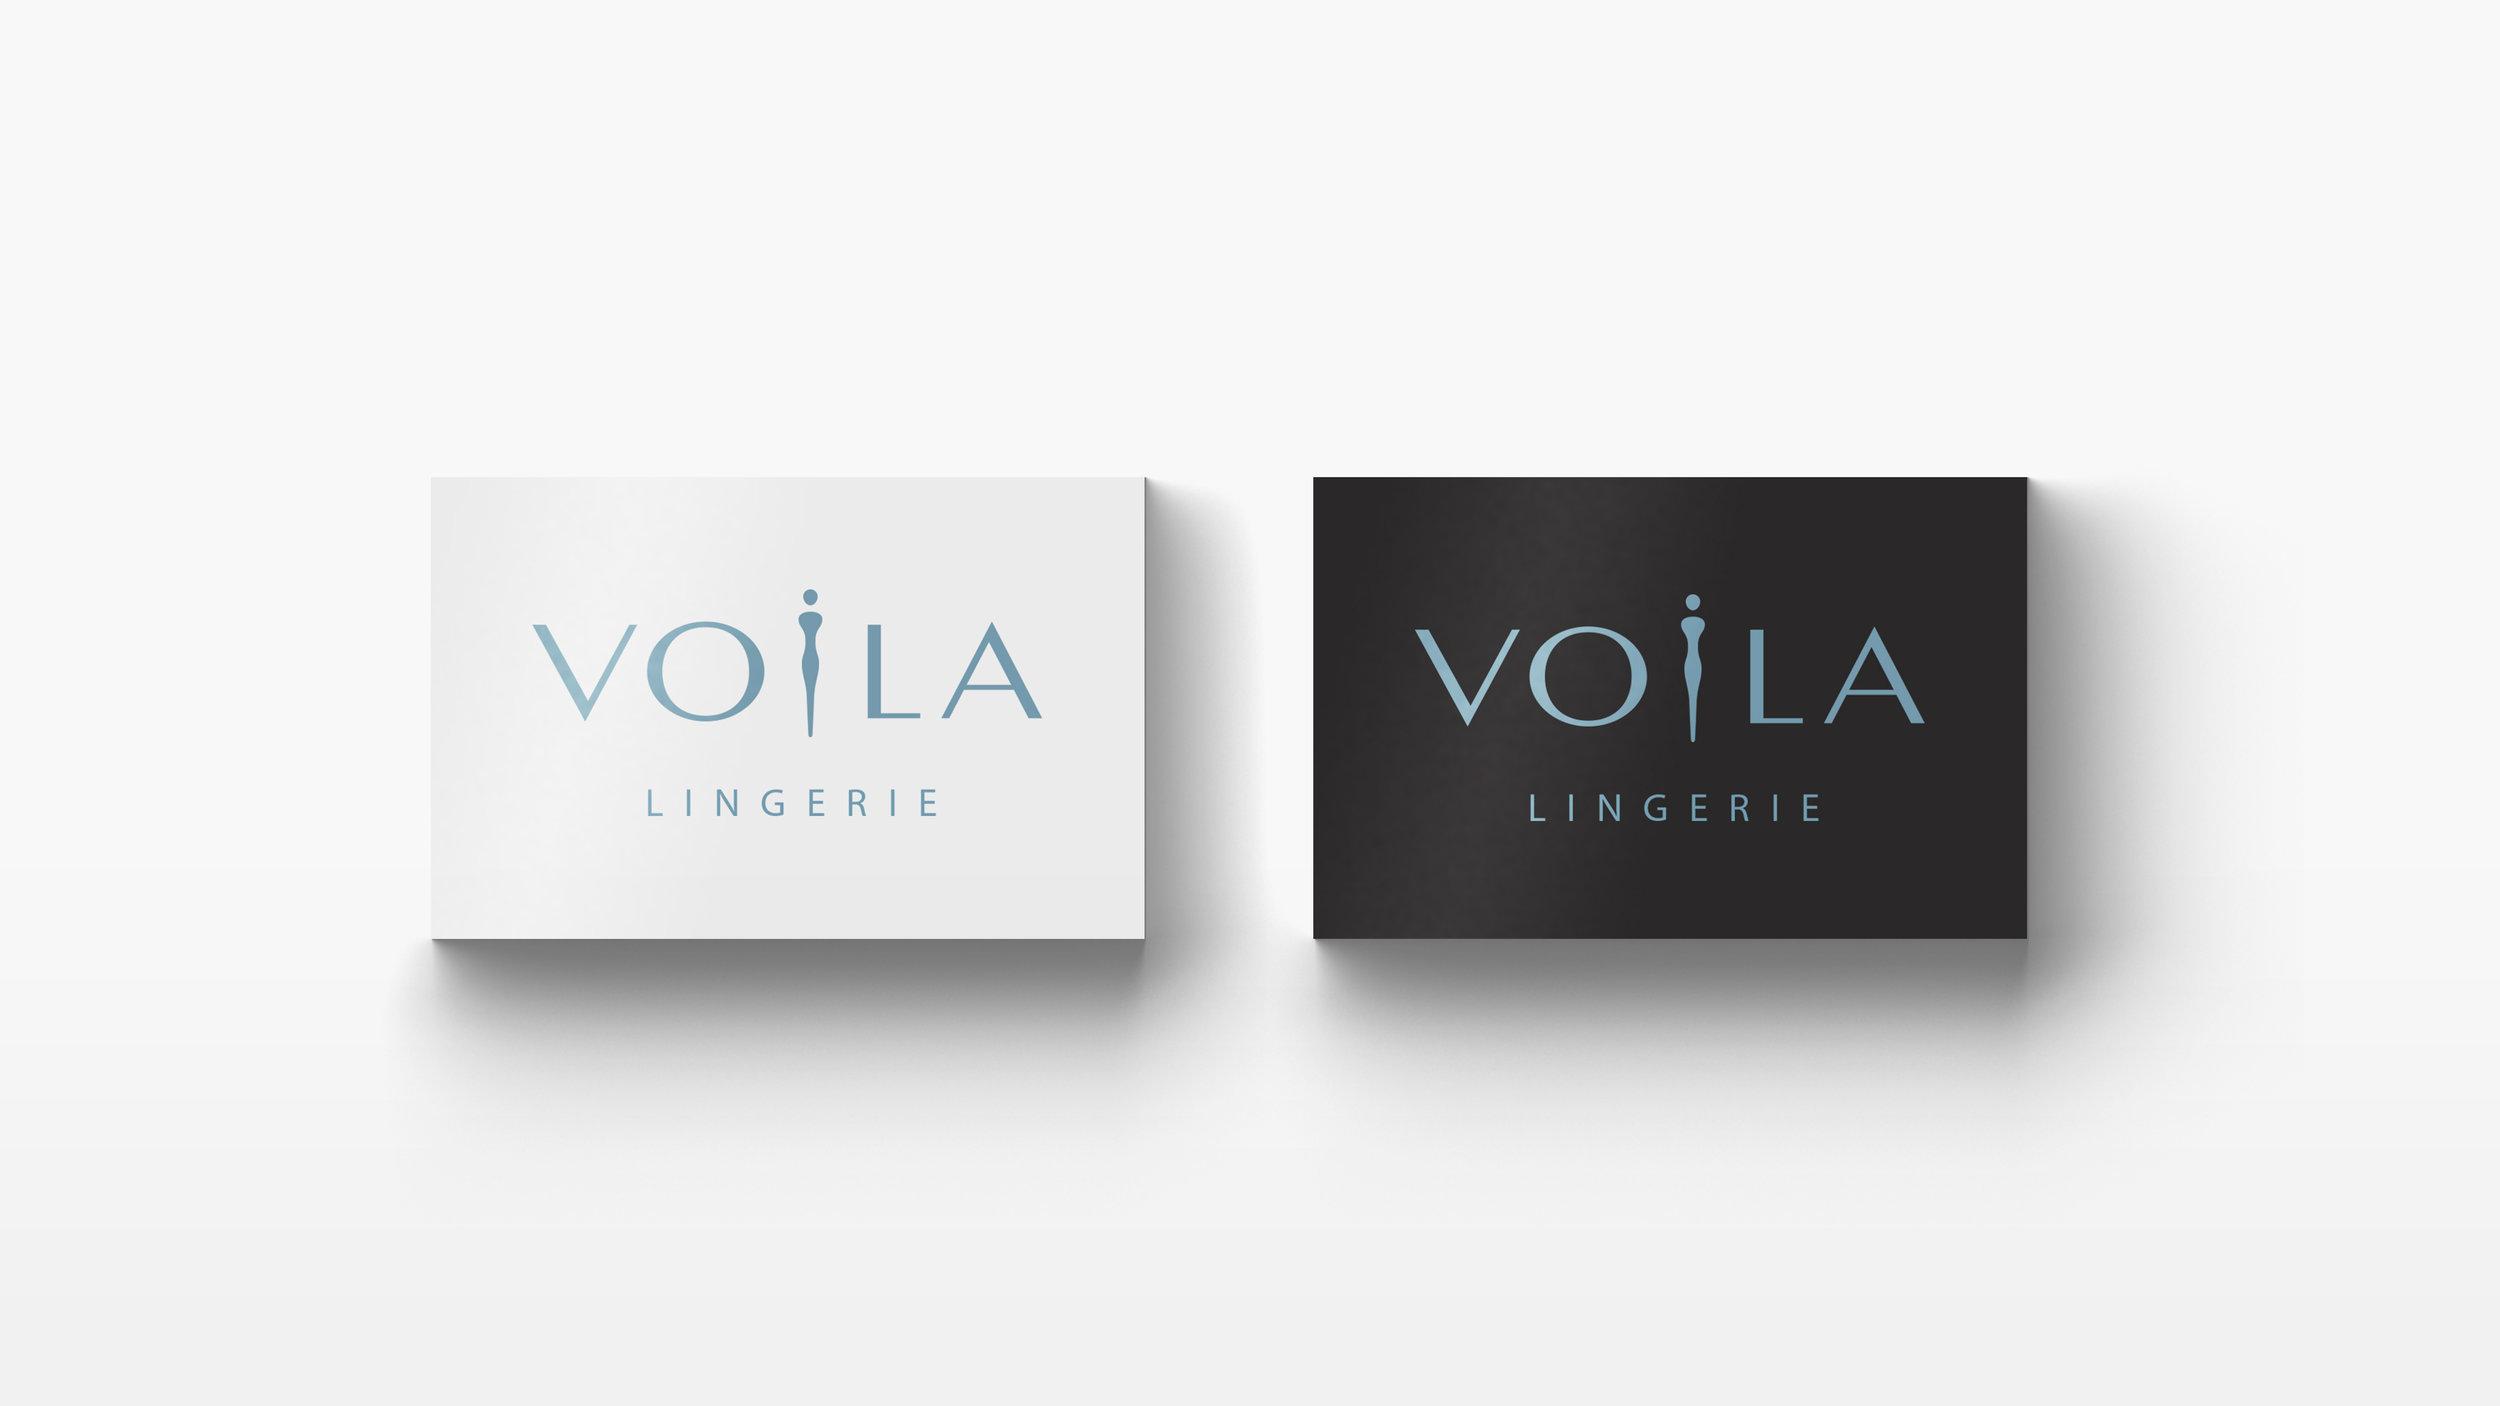 Brand_republica_voila_lingerie_logo_design_business_cards.jpg